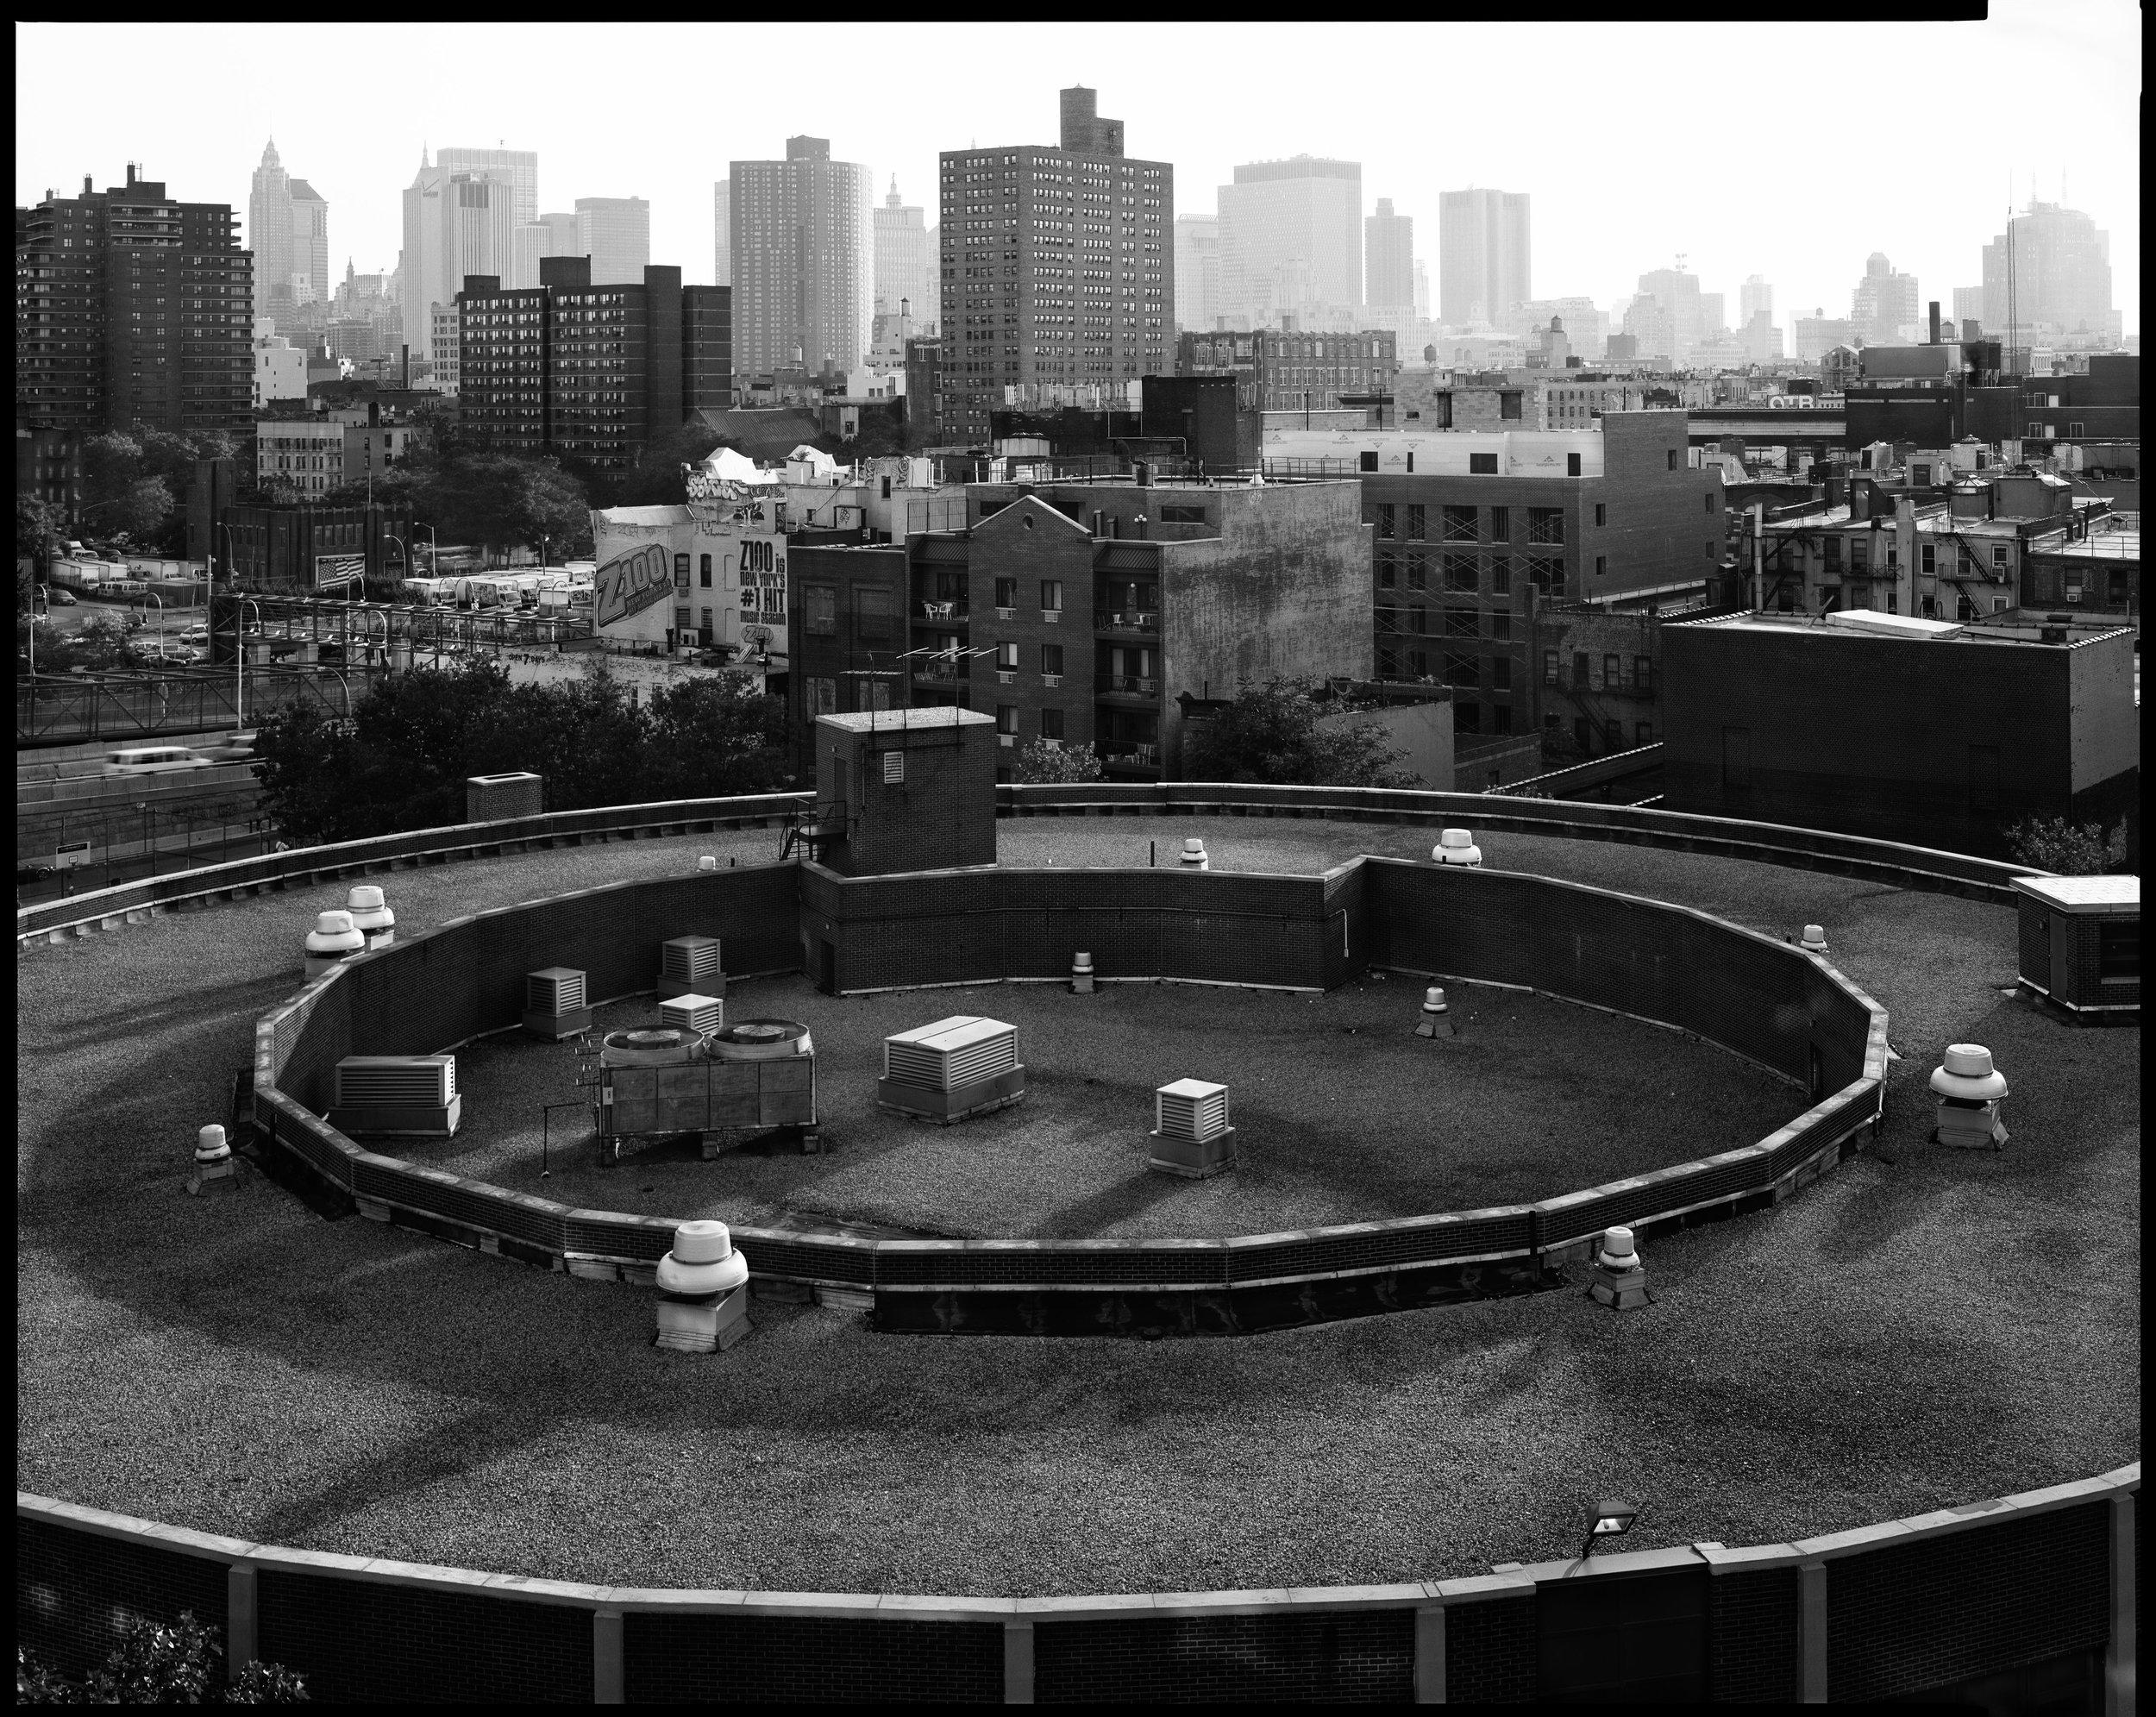 008___Circular_Roof_Manahattan.jpg